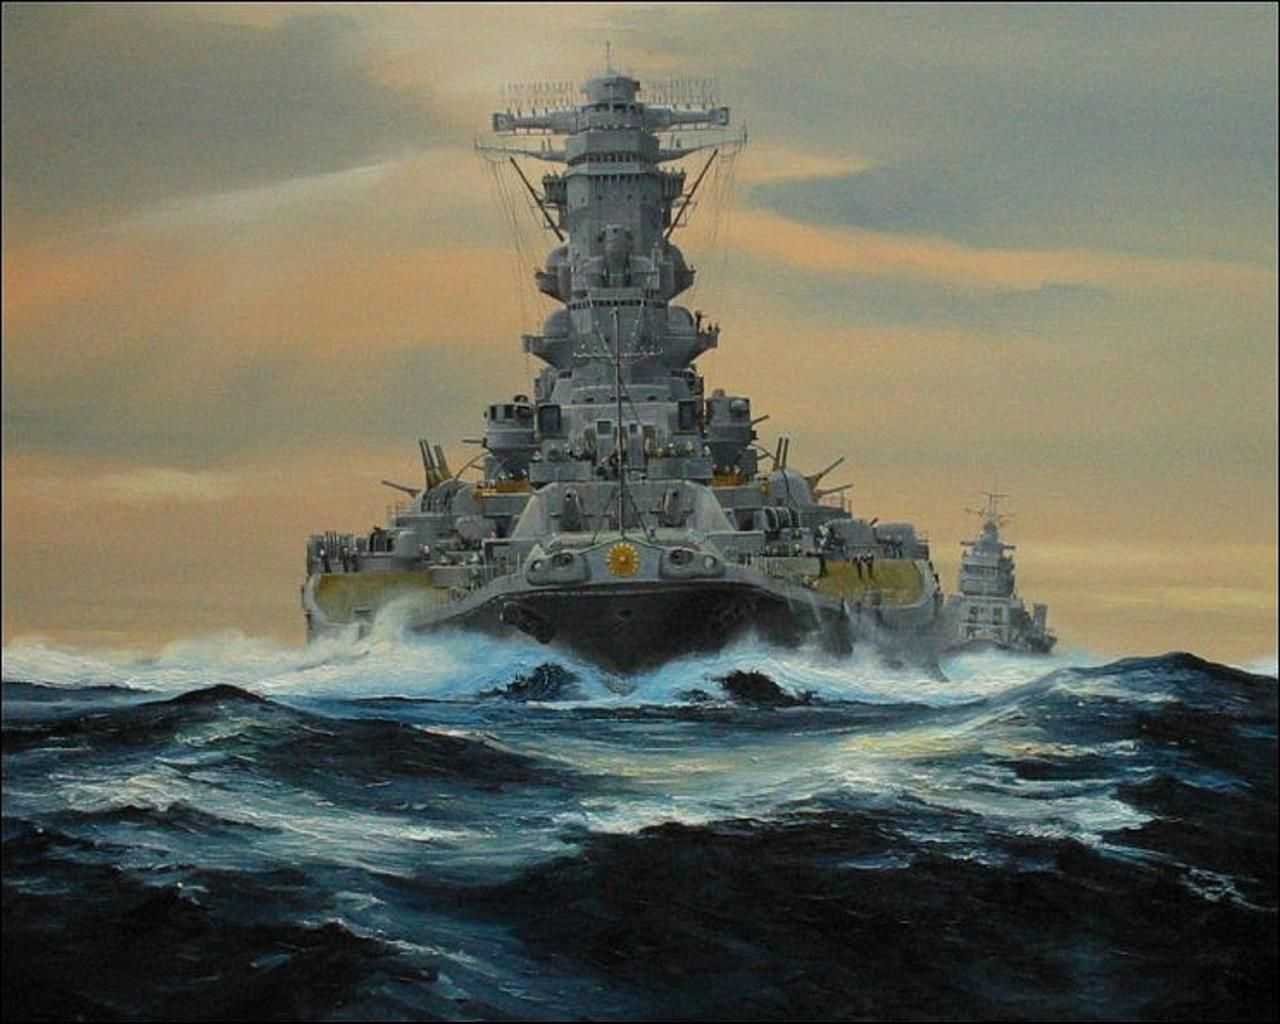 Battleship Yamato Wallpapers World Of Warships Wallpaper Battleship Yamato Battleship